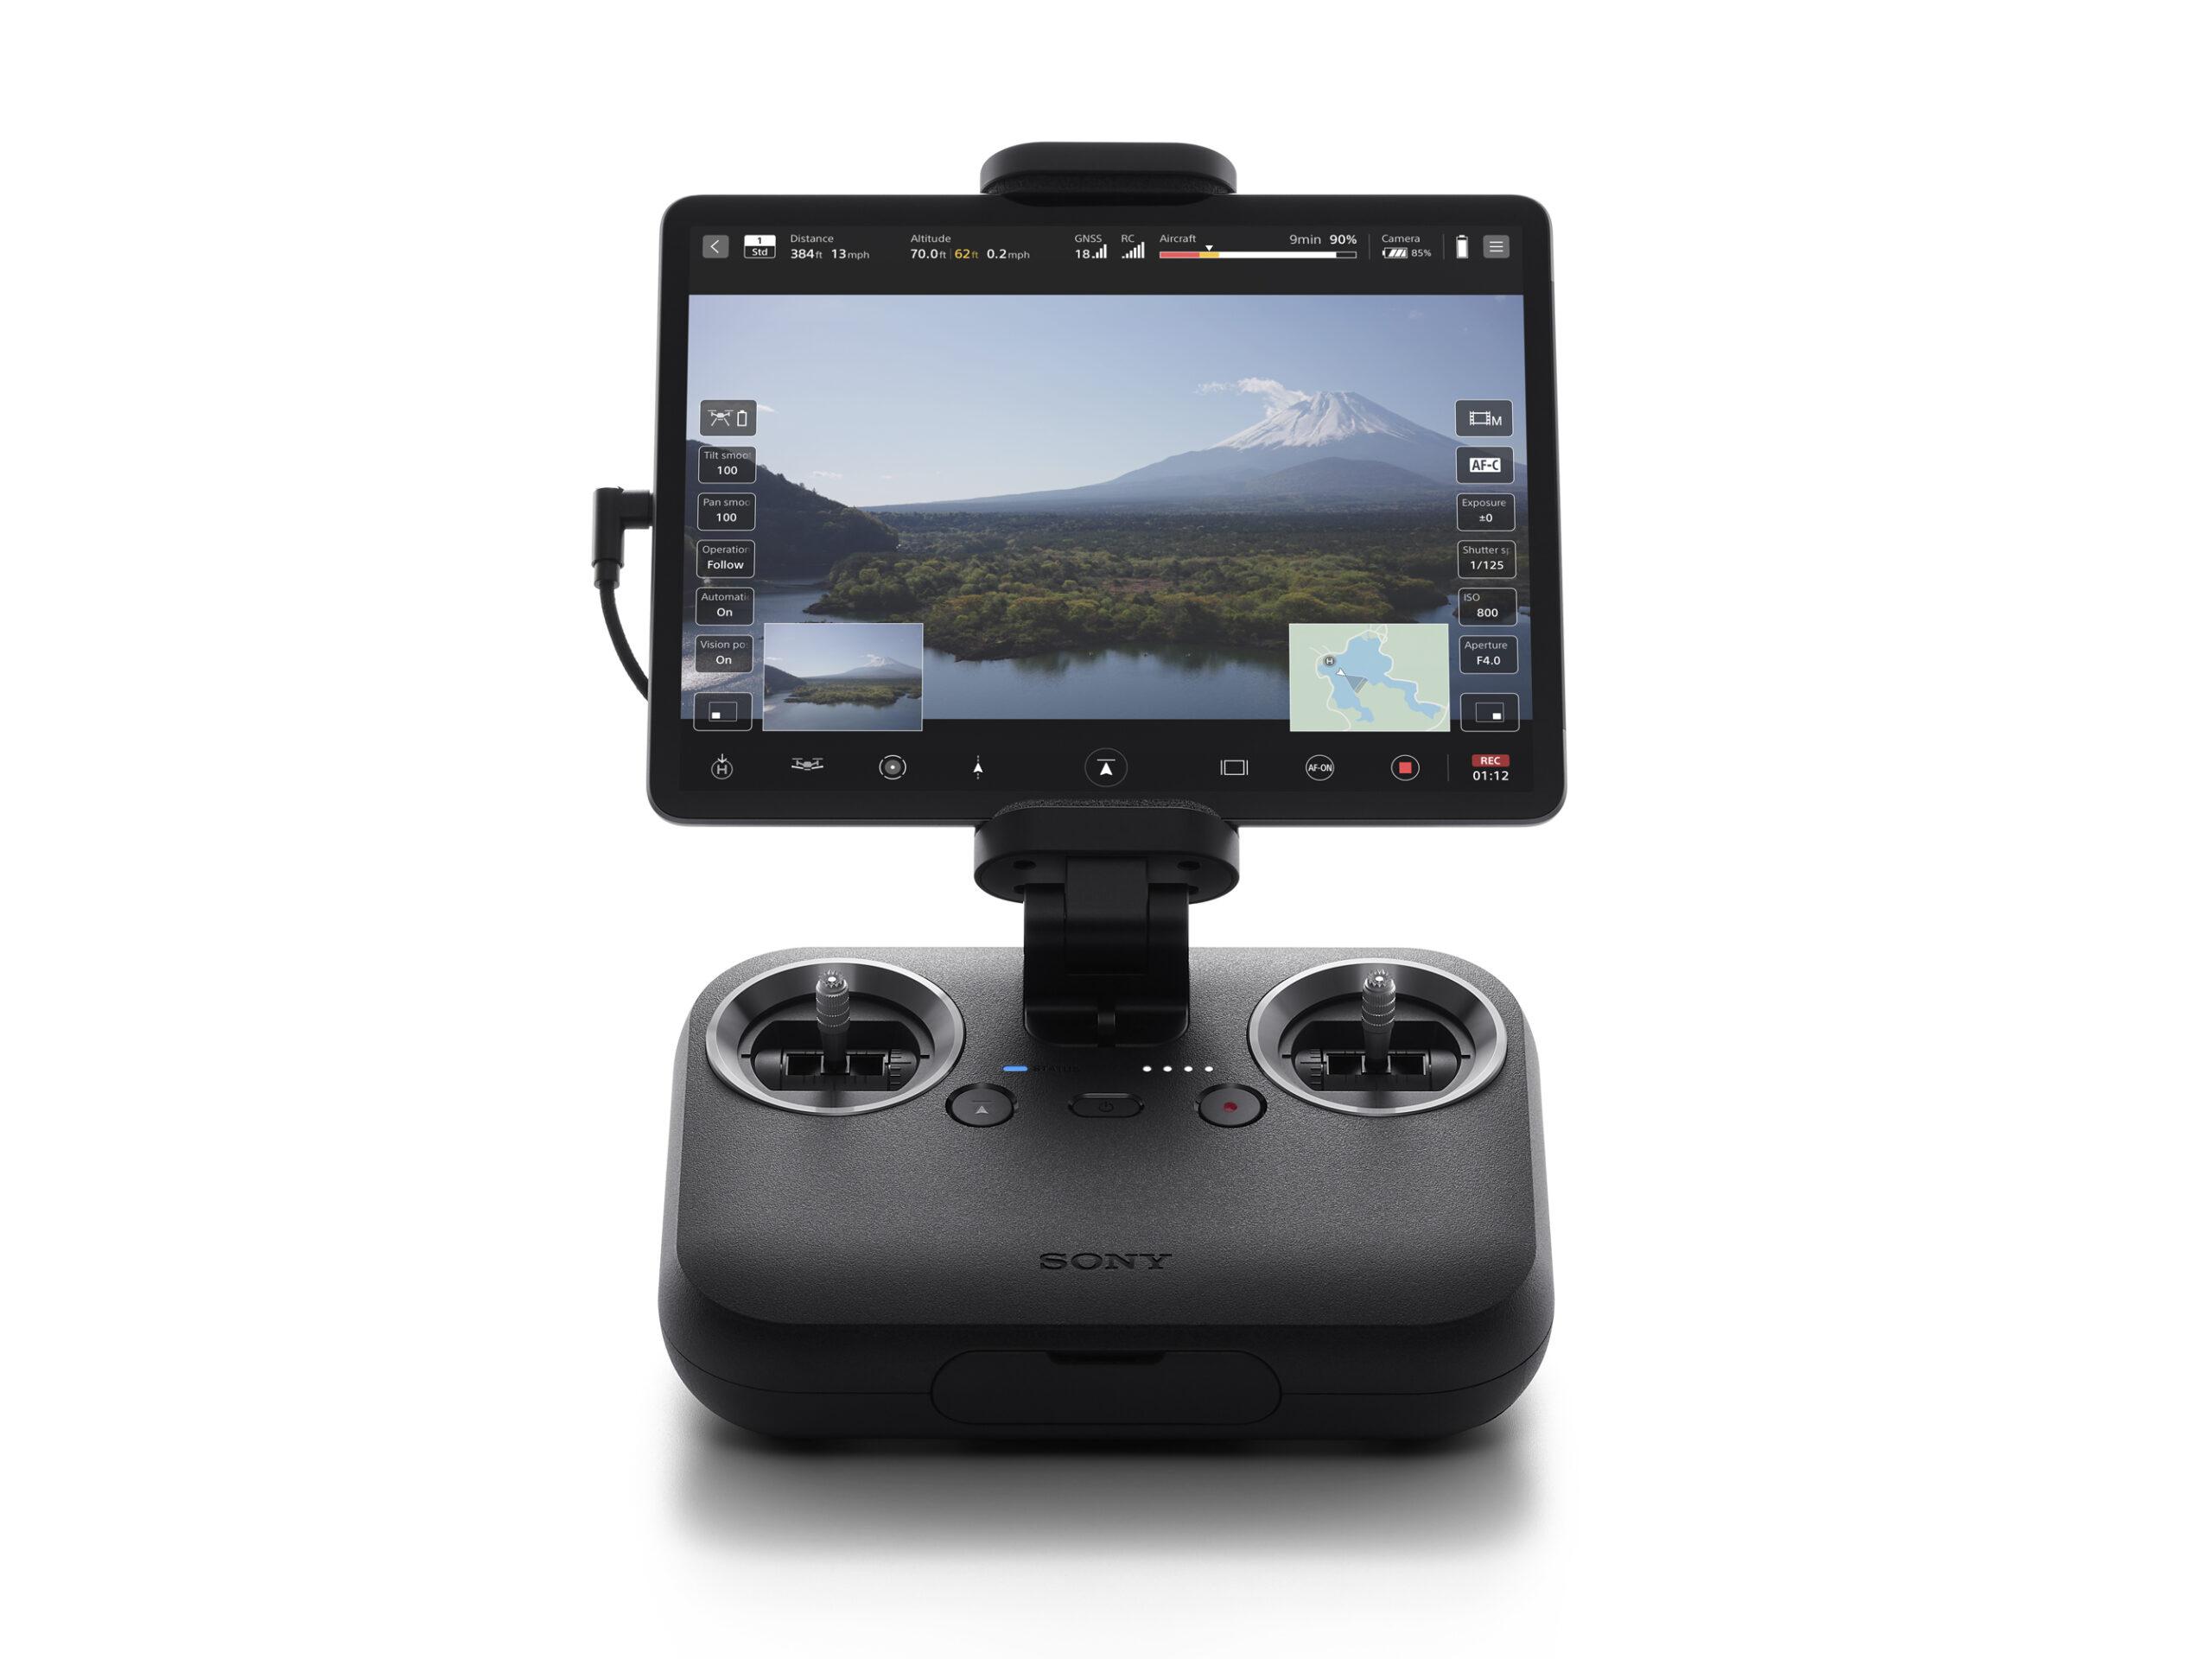 Sony Airpeak S1 Remote Control